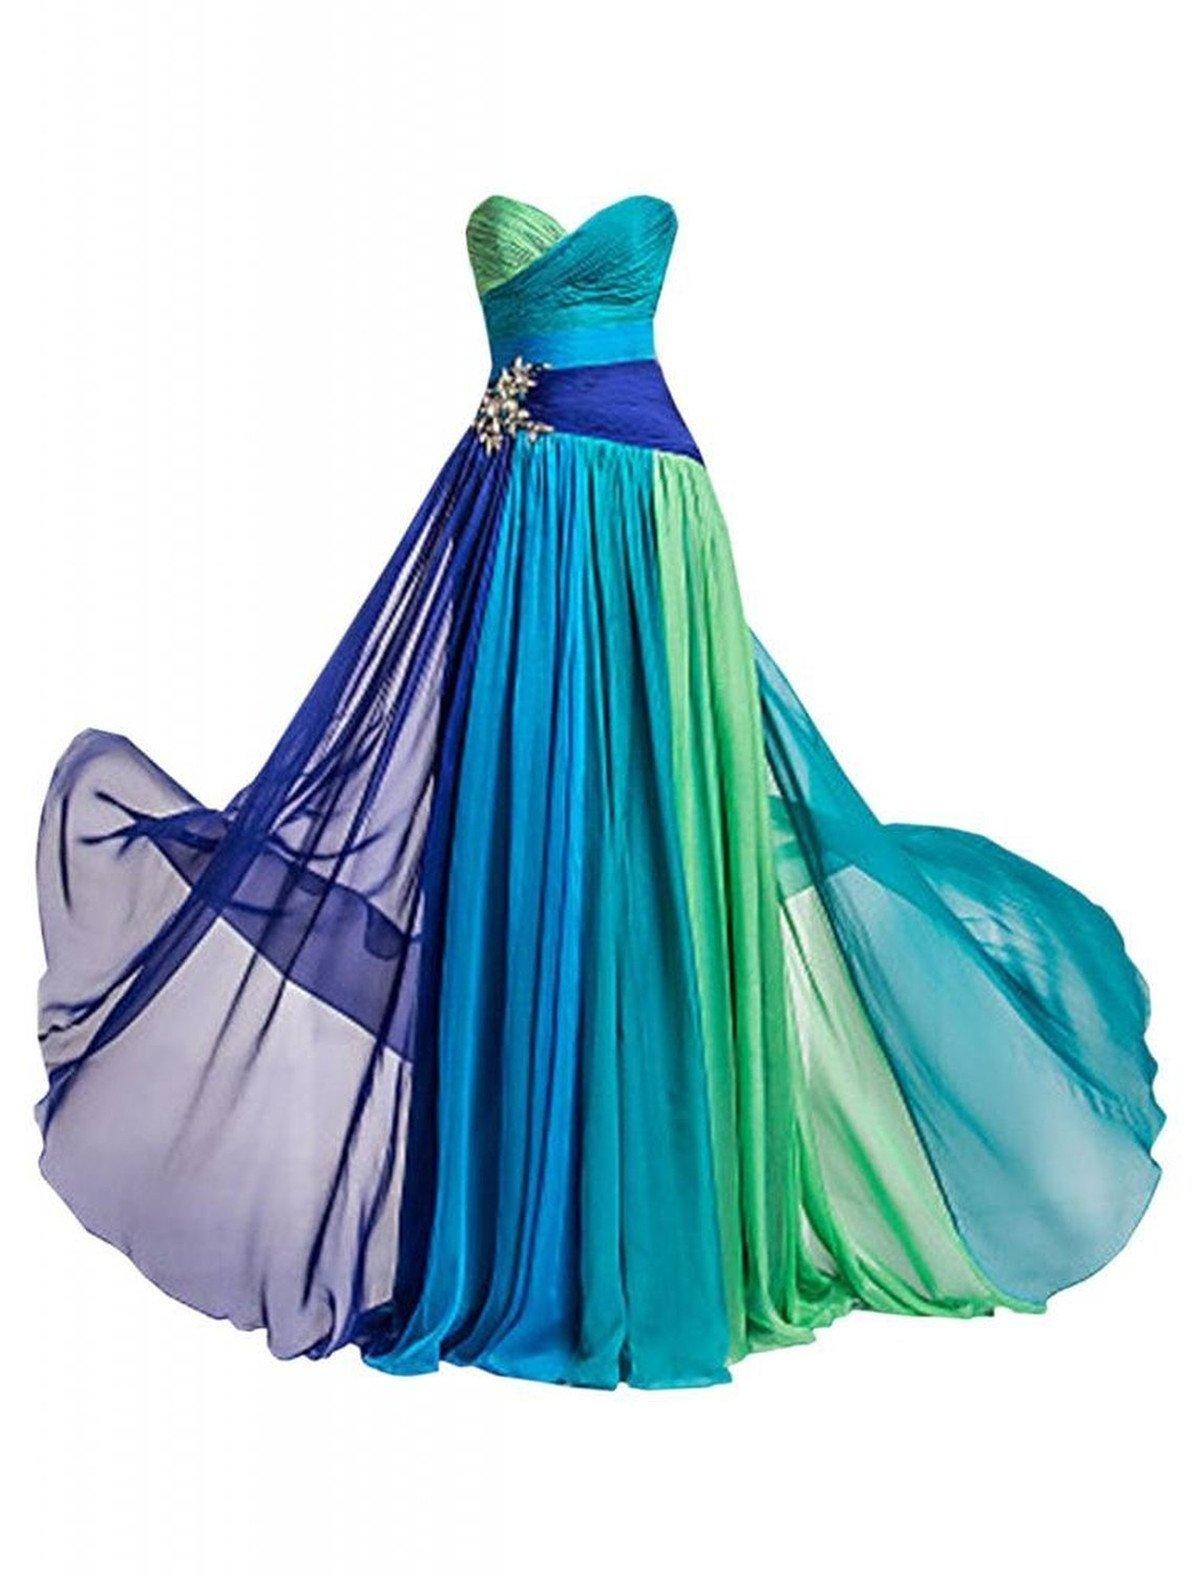 Dormencir Women's Rhinestone Colorful Long Bridesmaid Prom Evening Dresses (12) by Dormencir (Image #1)